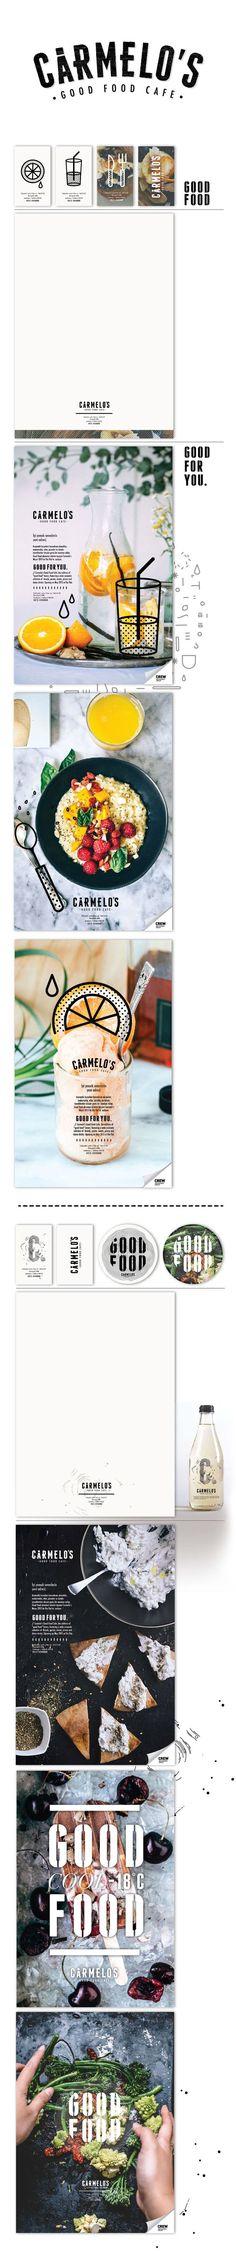 Branding for new baby CARMELO'S